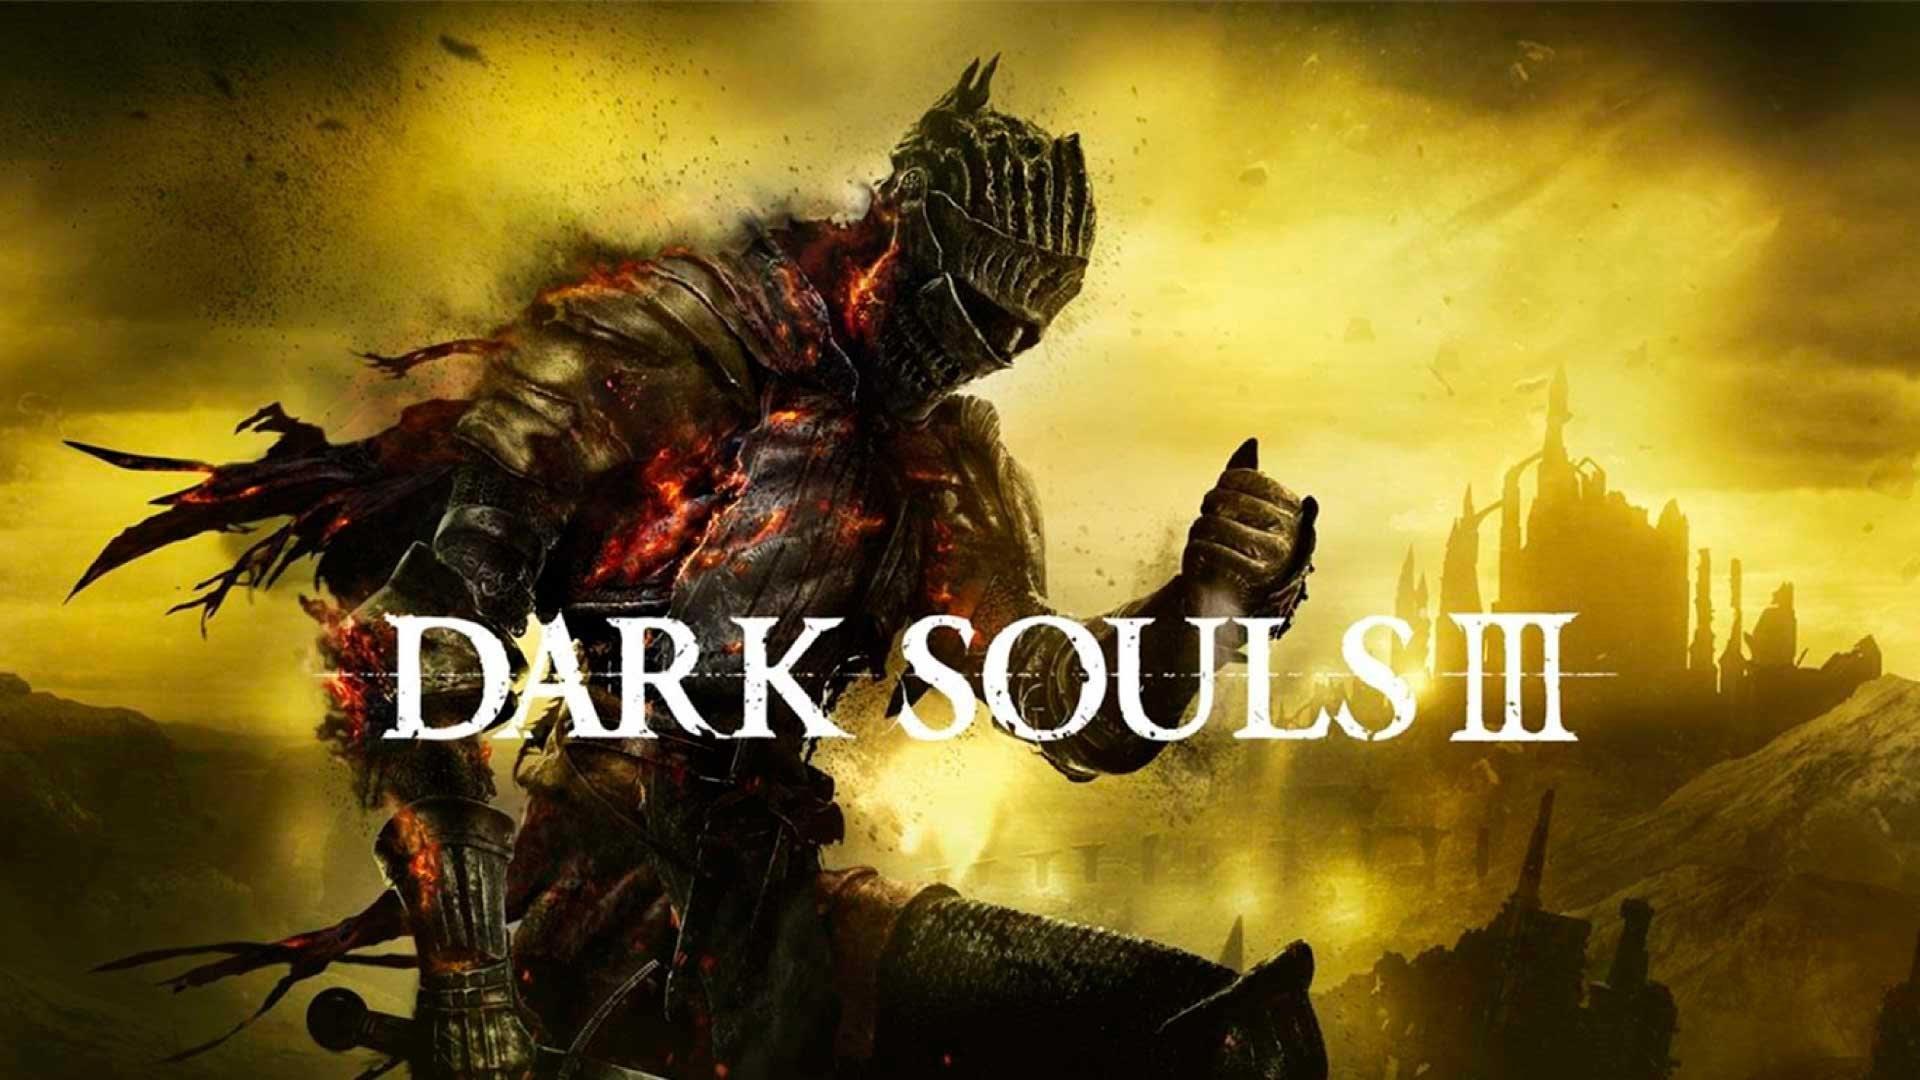 Dark Souls 3 Hd Wallpapers 7wallpapers Net